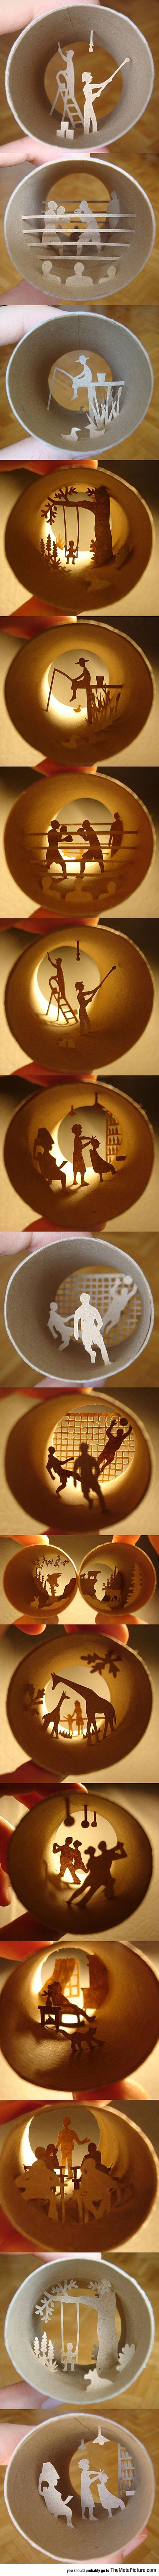 cool-toilet-paper-roll-art